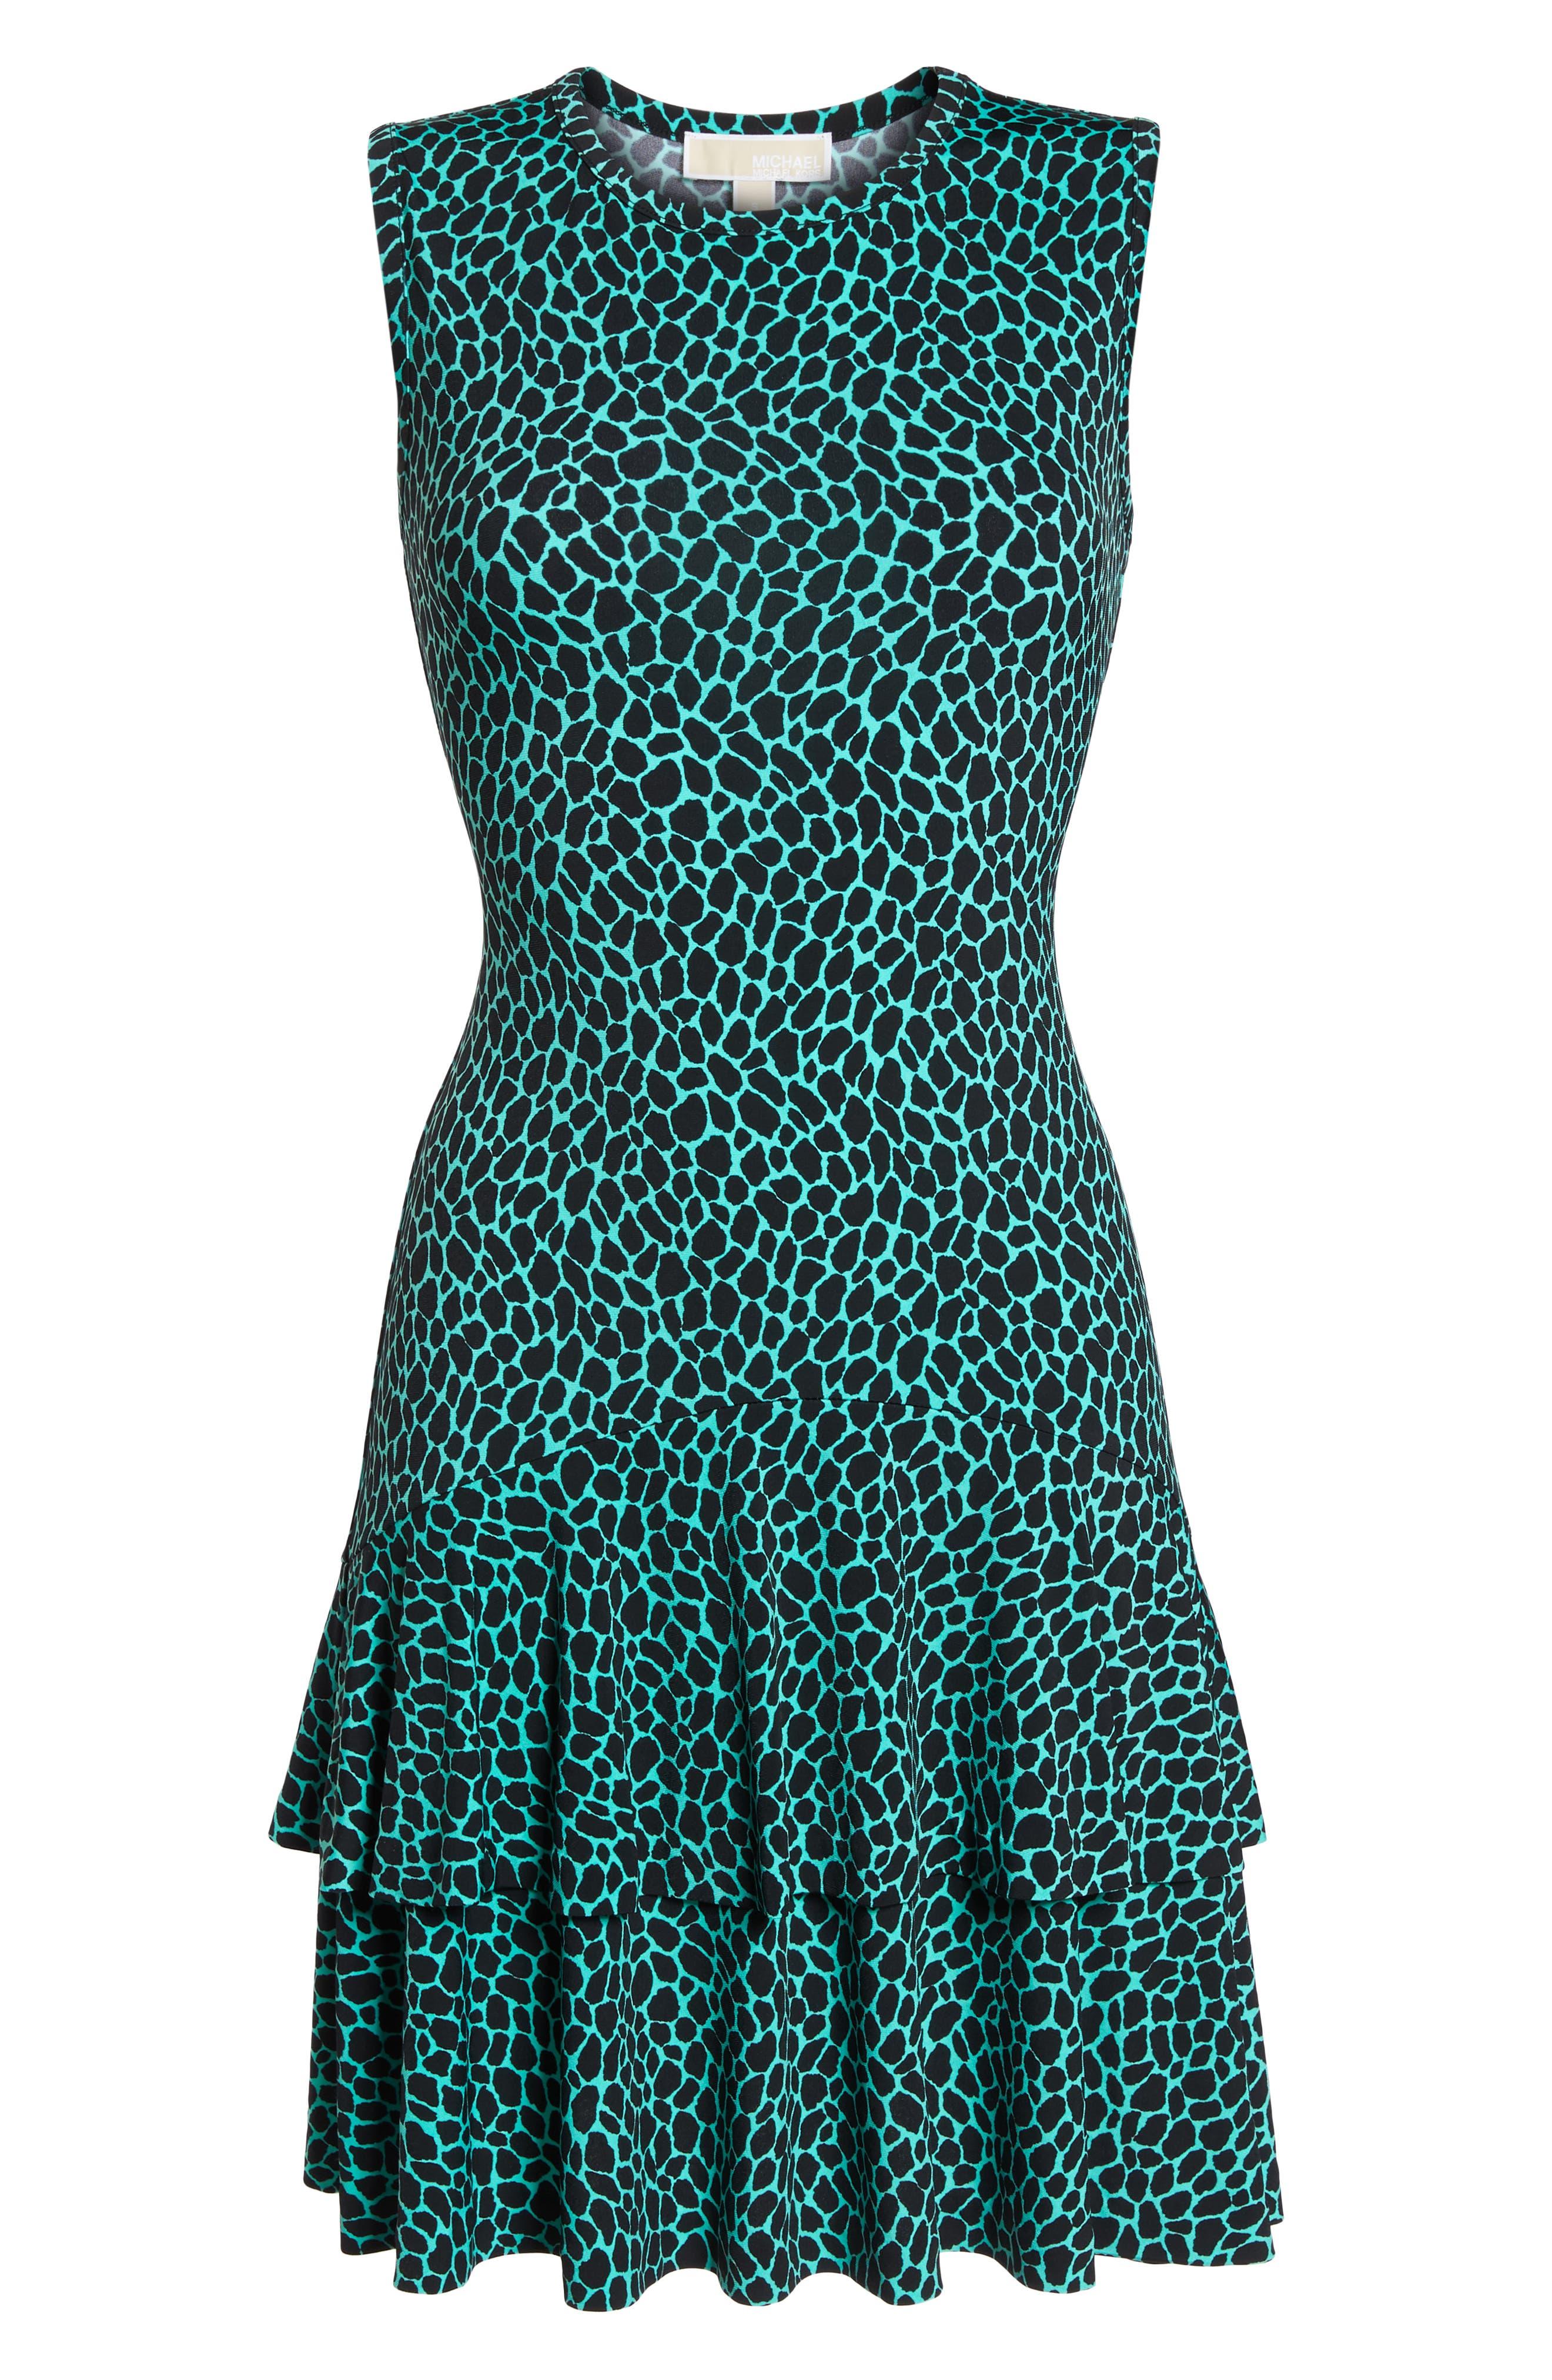 Leopard Print Flounce Hem Dress,                             Alternate thumbnail 7, color,                             Aqua/ Black